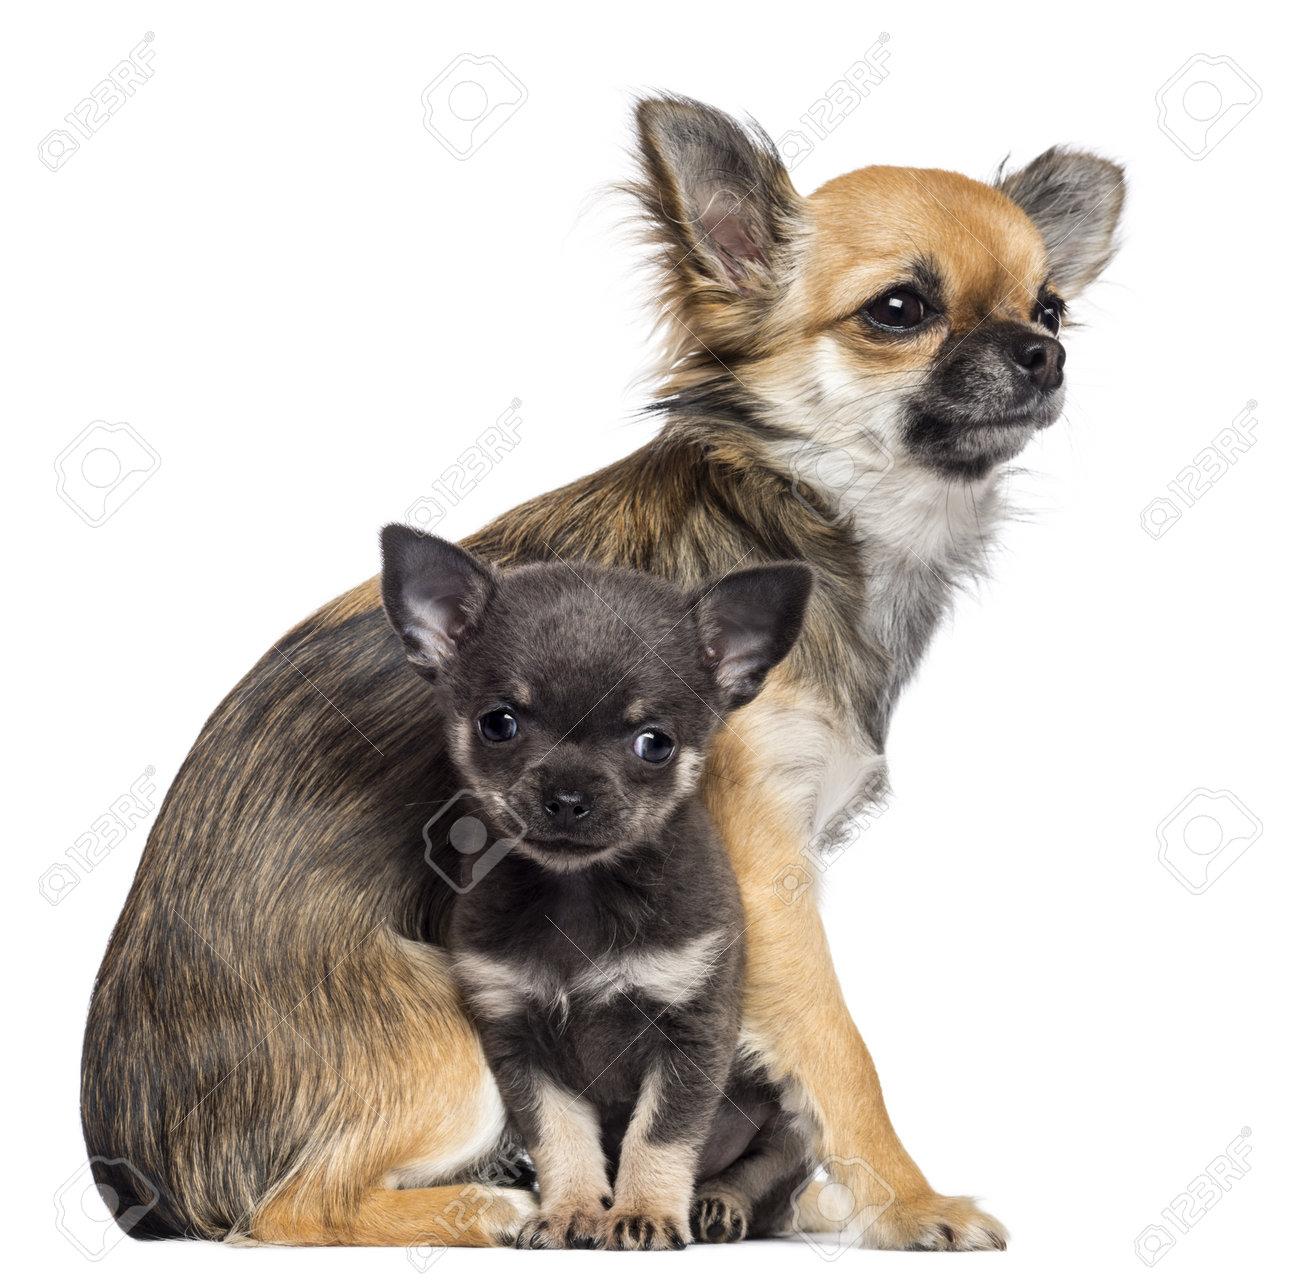 Chihuahua 9 Months Chihuahua puppies  9 months